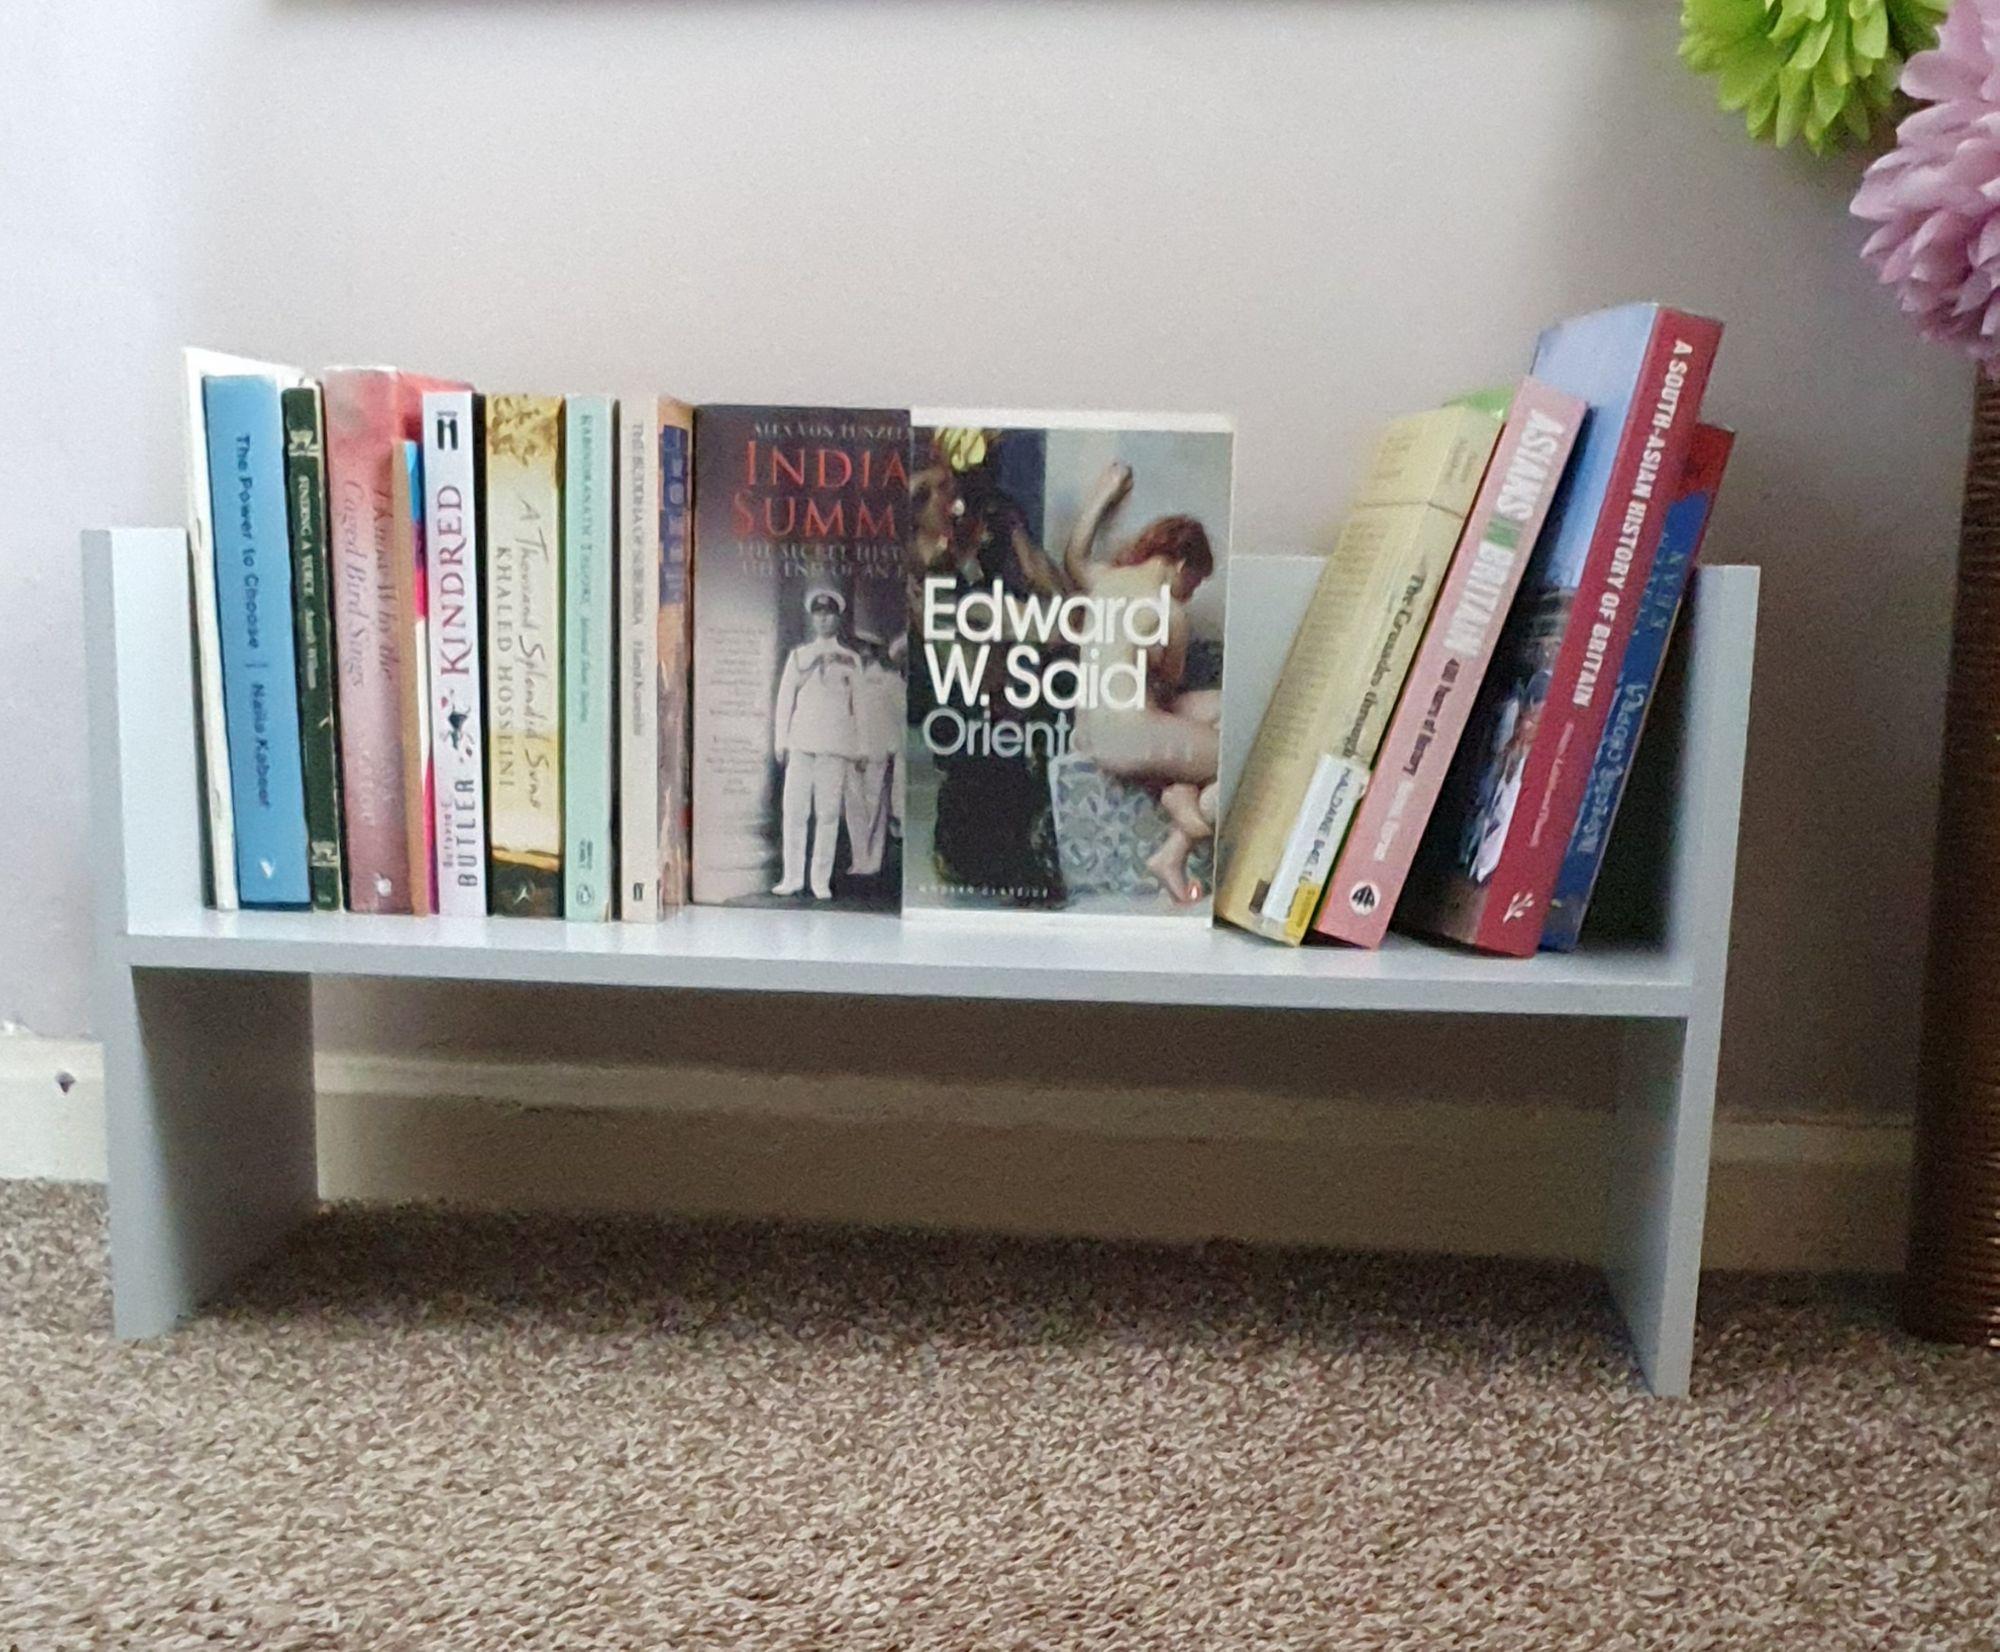 A free standing shelf of books